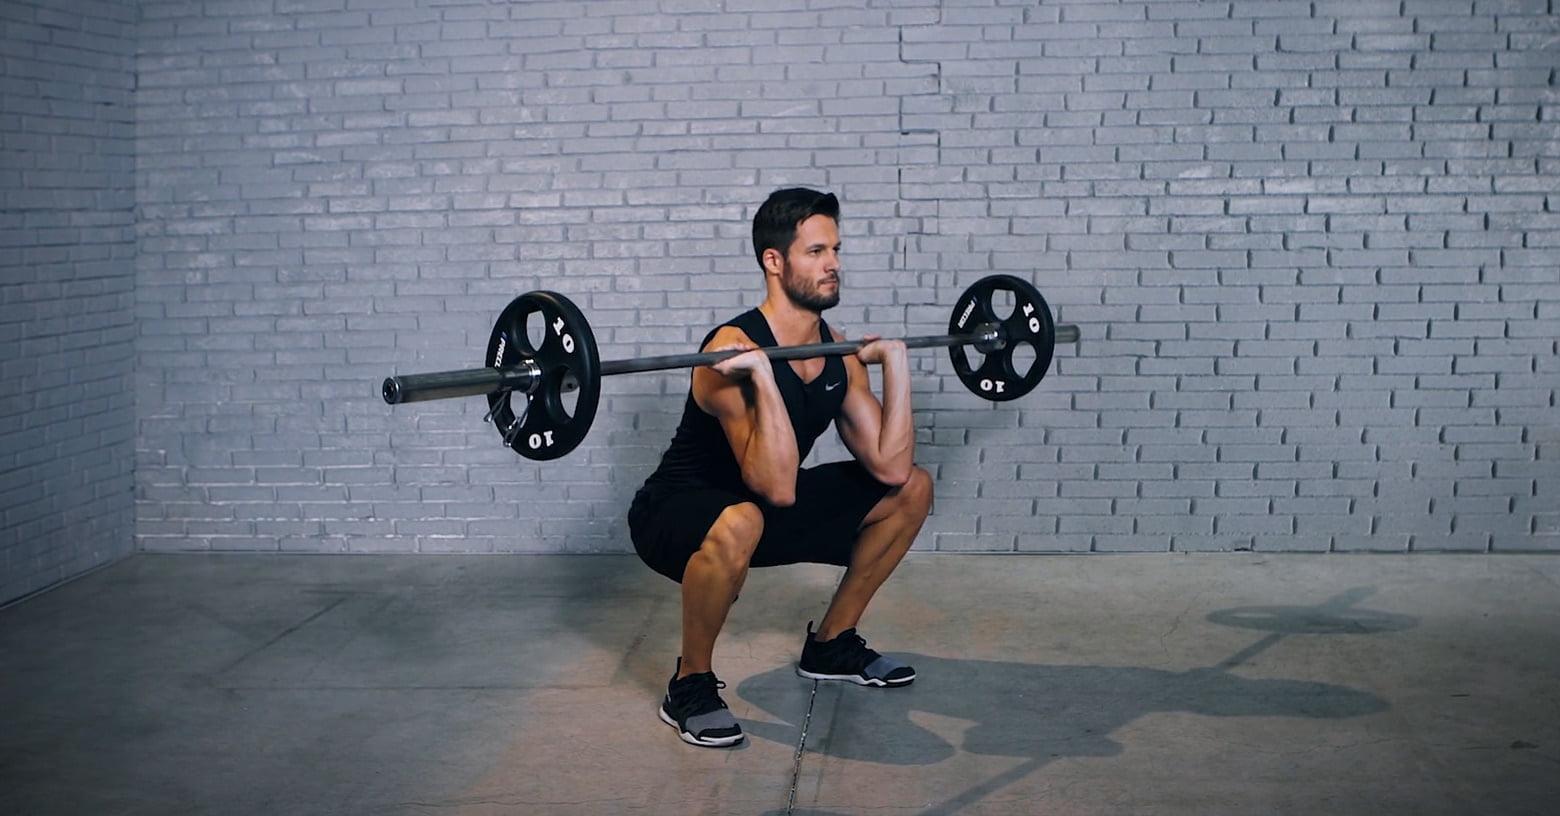 barbell front squat - Squat avant avec haltère - Langhantel Front-Kniebeuge - EVO Fitness